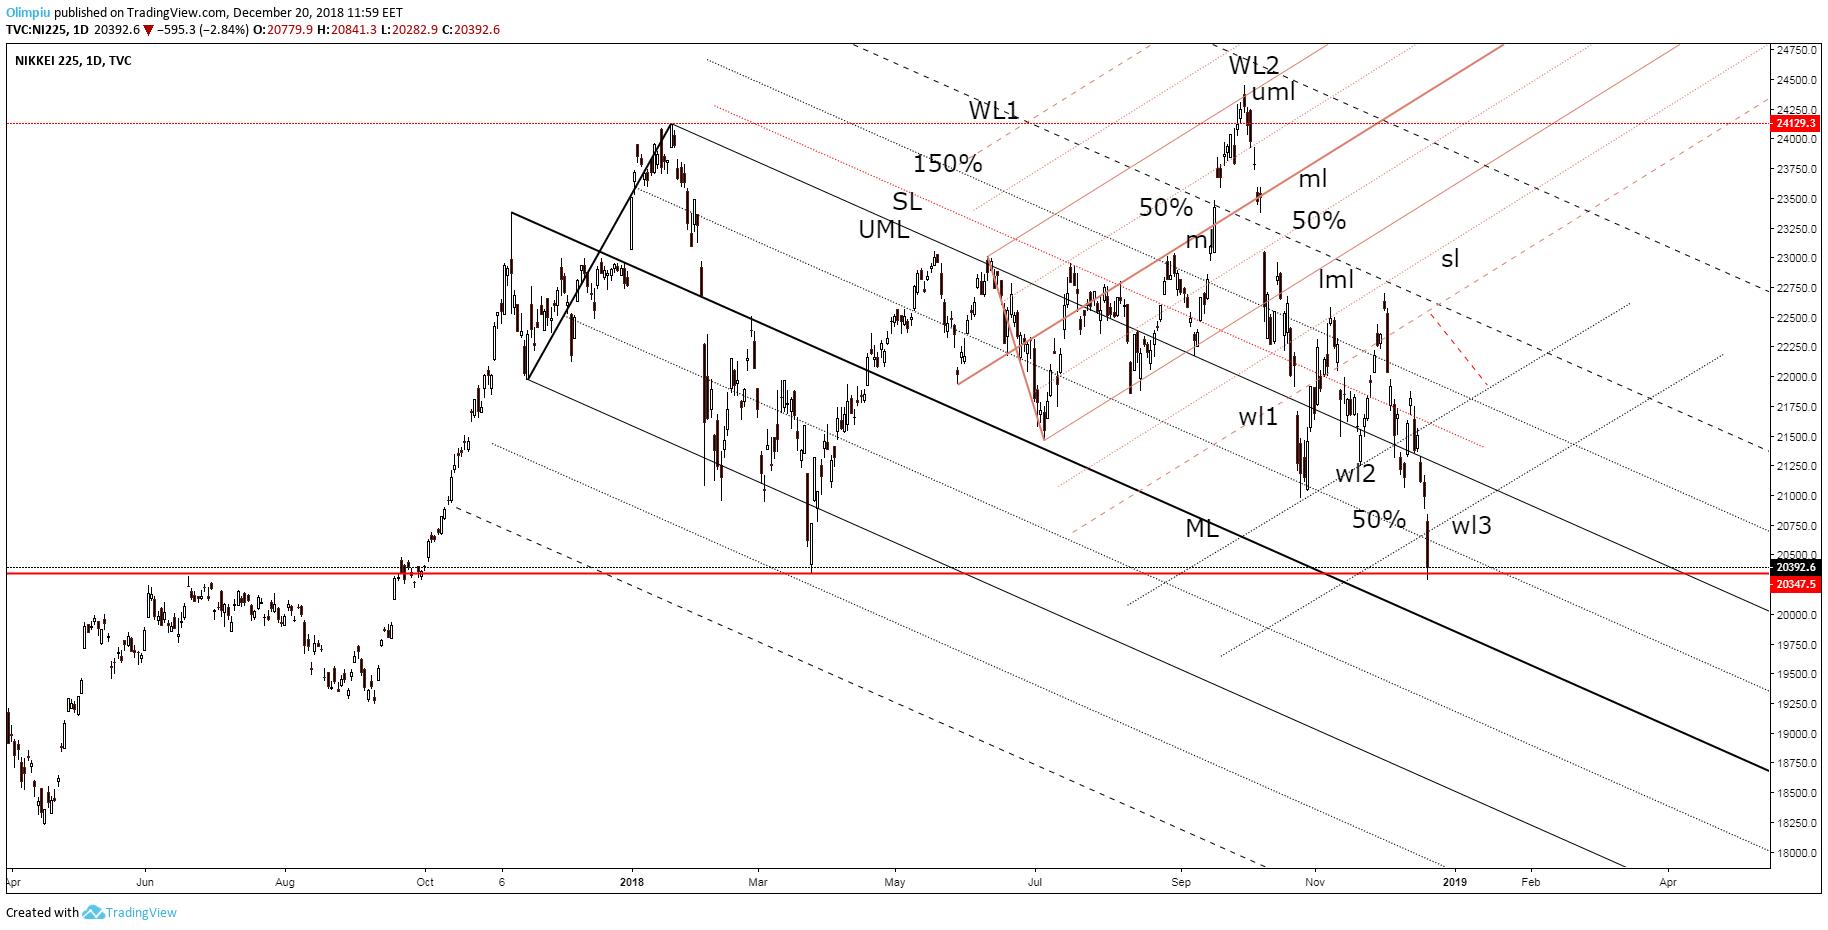 Forex Trading: The Yen has accelerated the bullish momentum